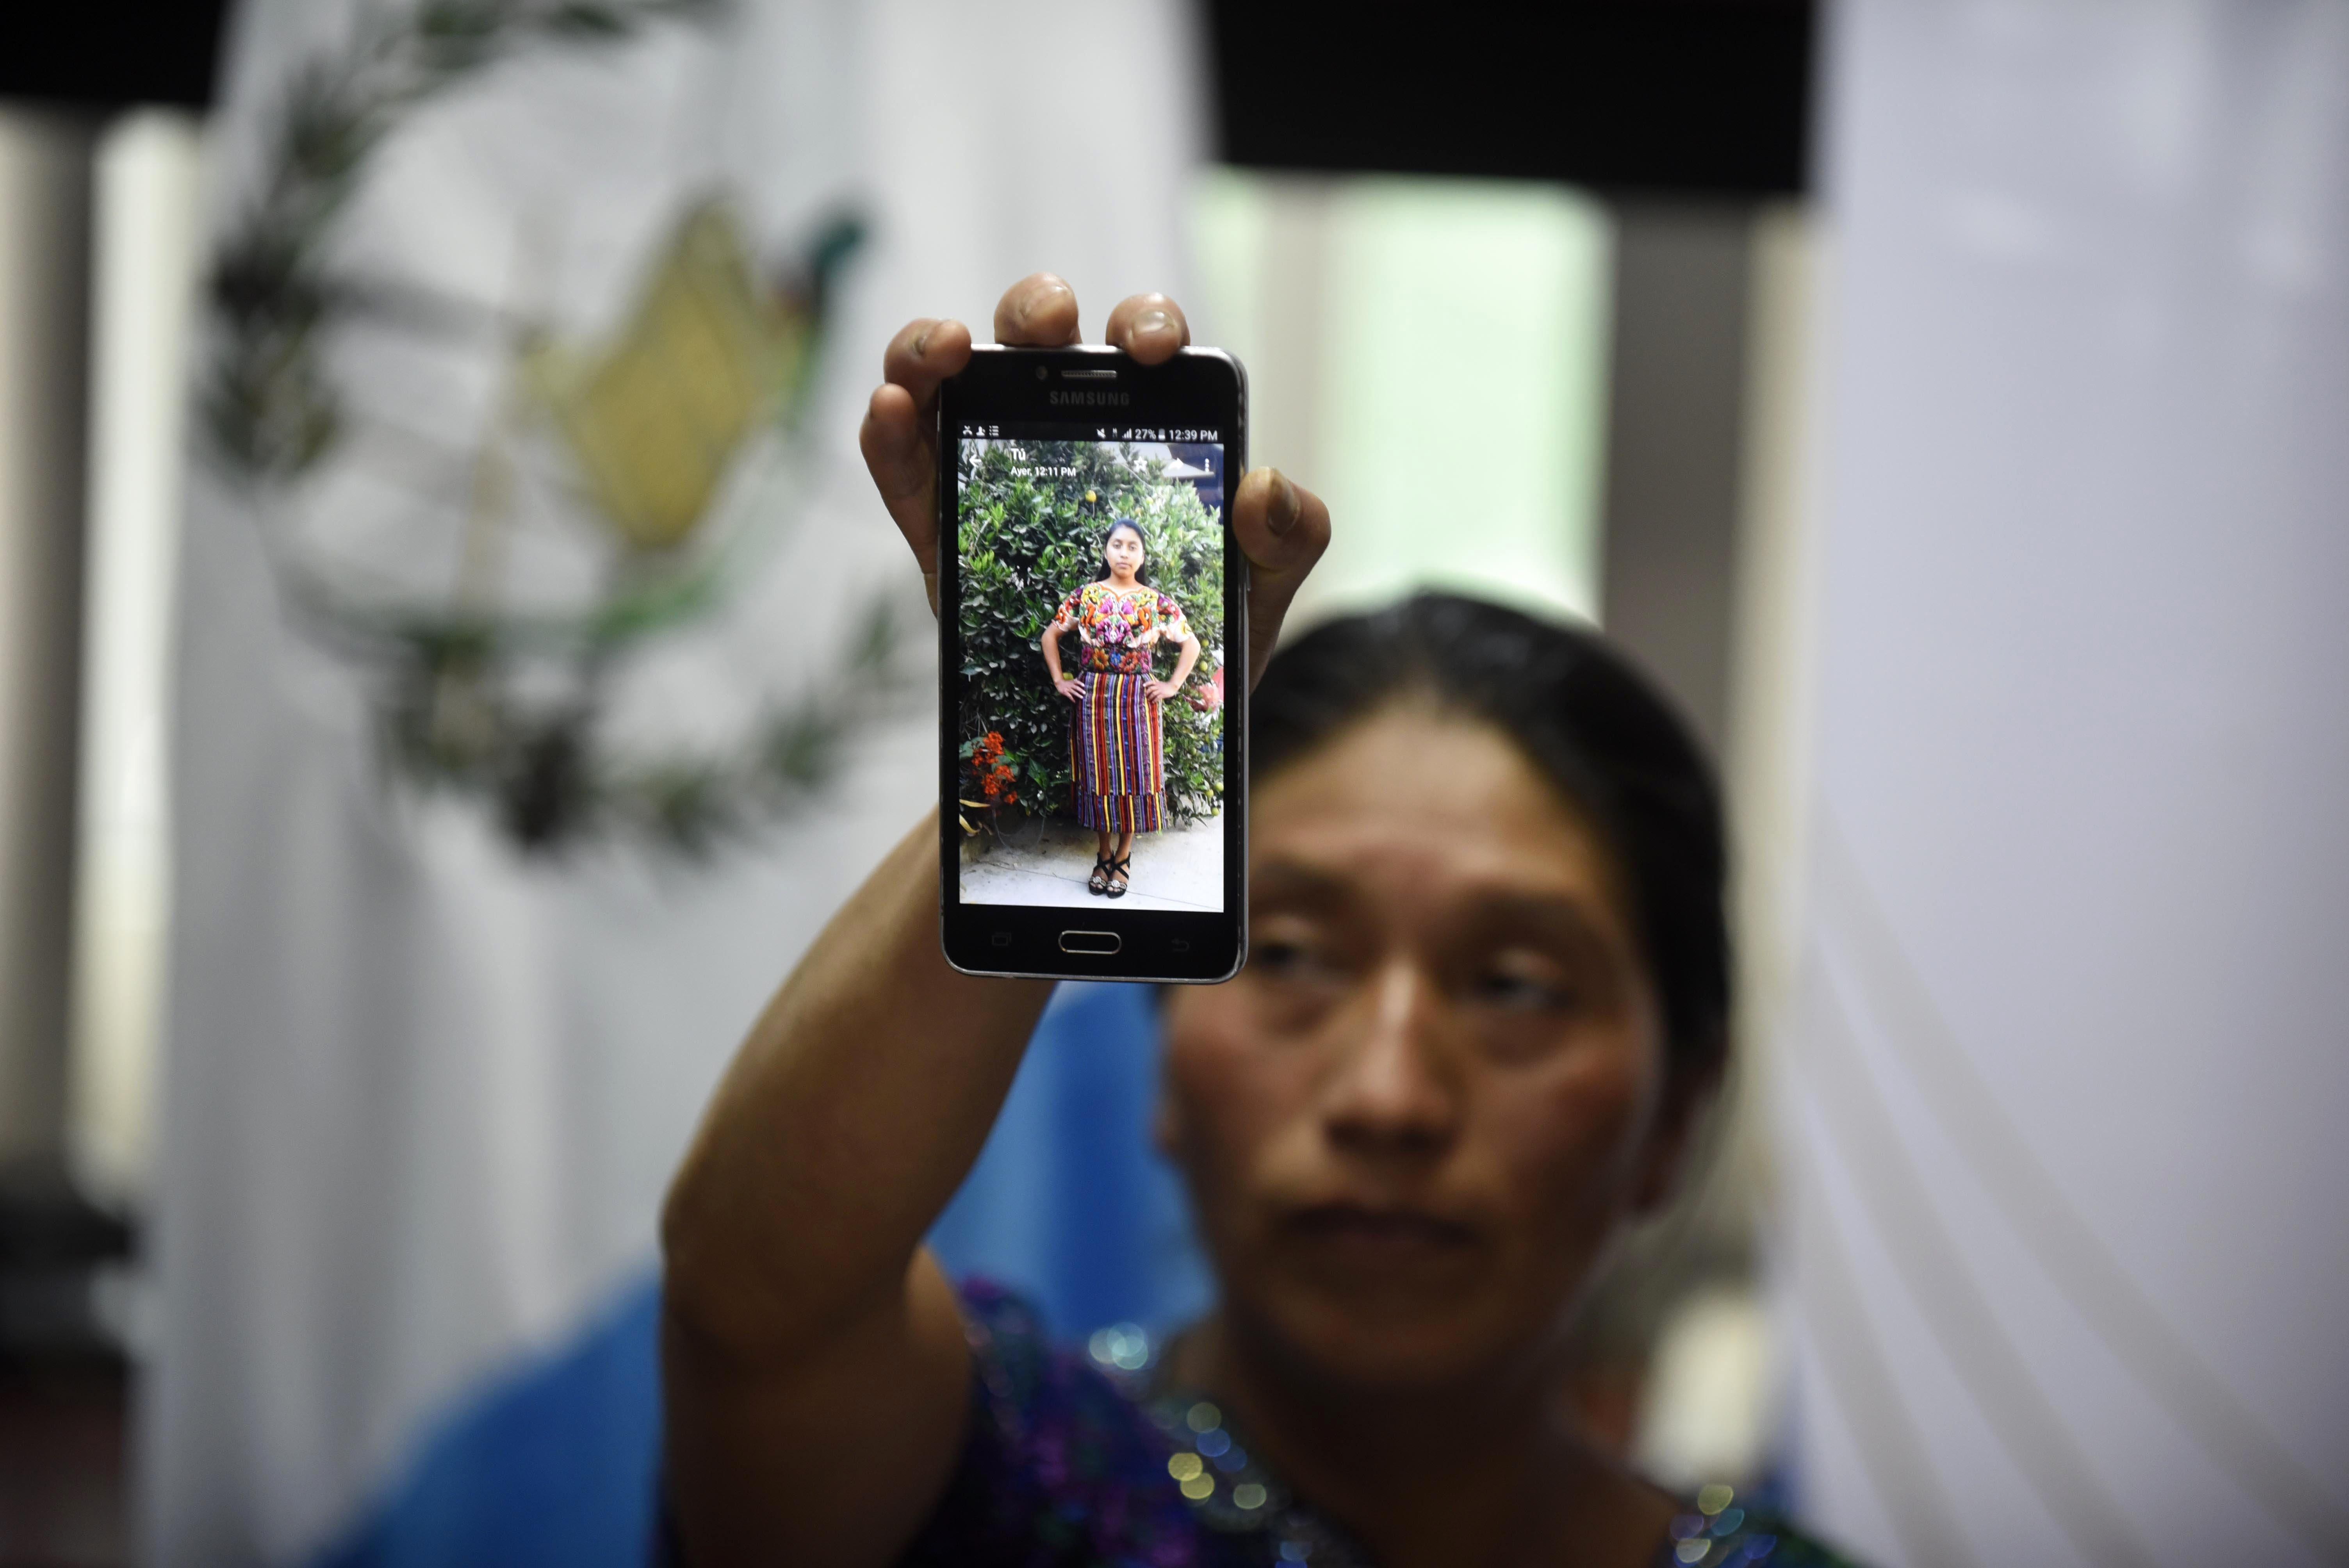 A Border Patrol agent fatally shotClaudia Patricia Gómez Gonzáles, an indigenous woman from Guatemala, wh